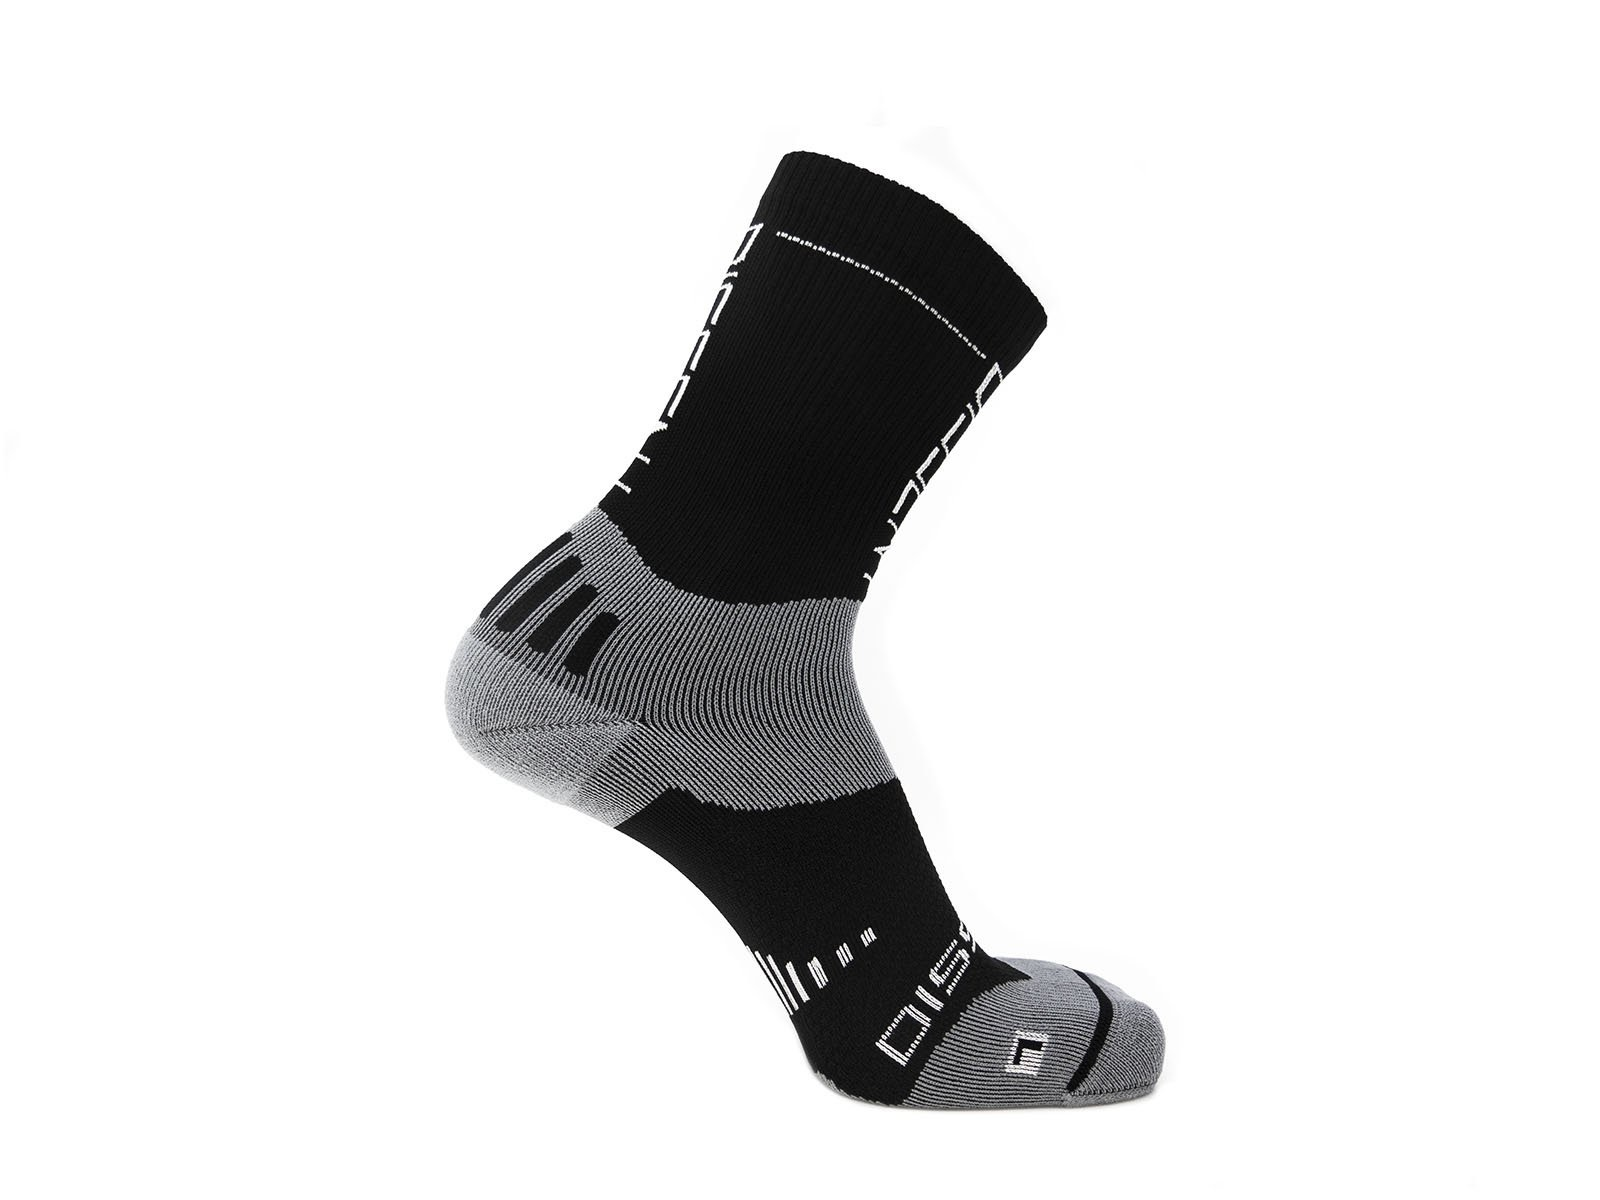 "Dissent, Supercrew Nano 6"", Compression socks, Black-1"